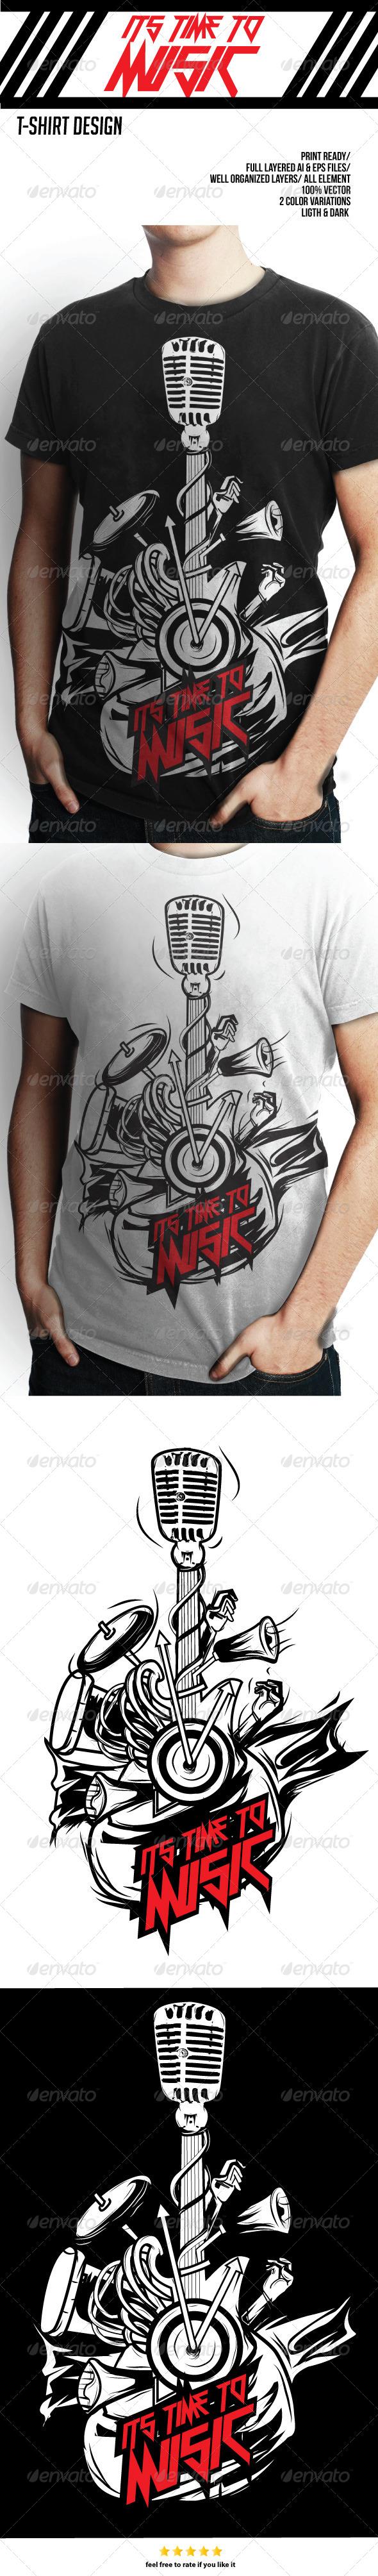 T-Shirt Design Music - Events T-Shirts